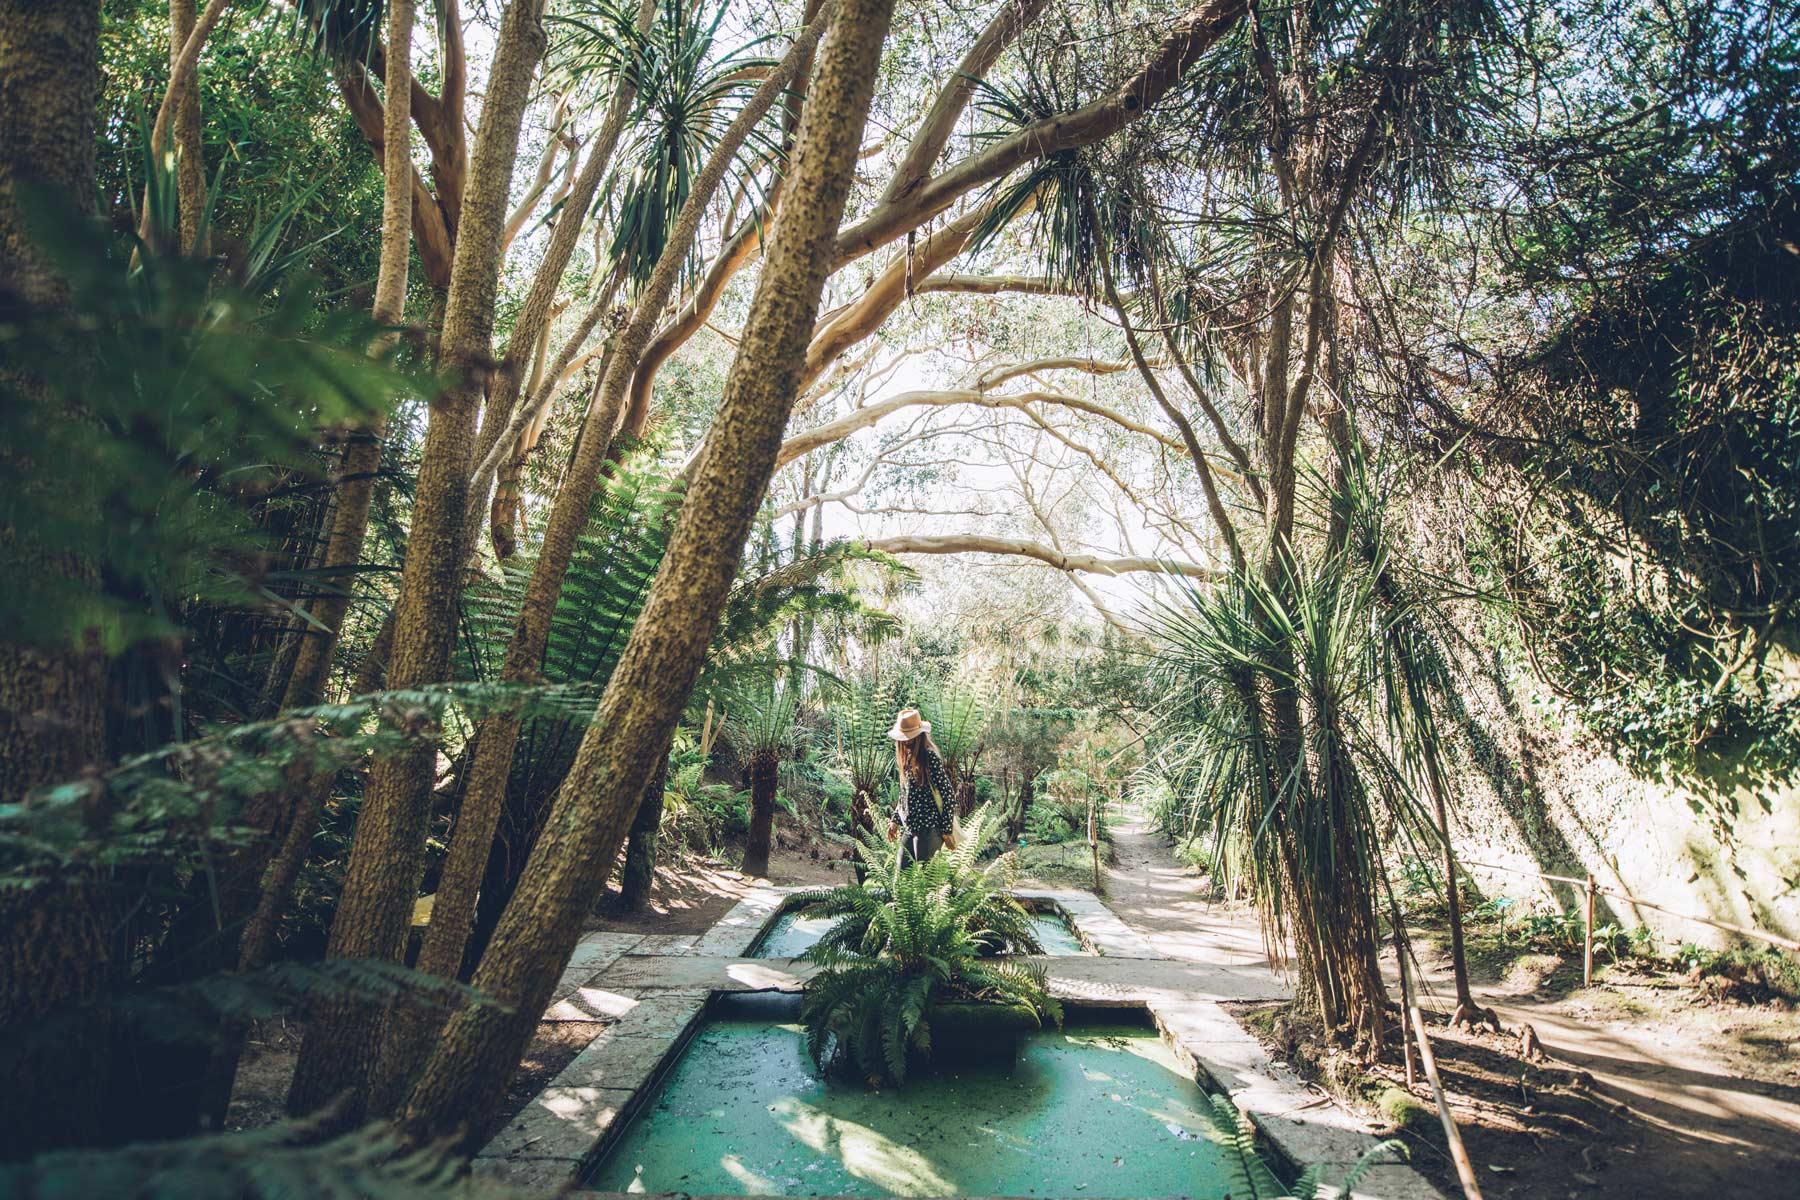 Le Jardin de Vauville